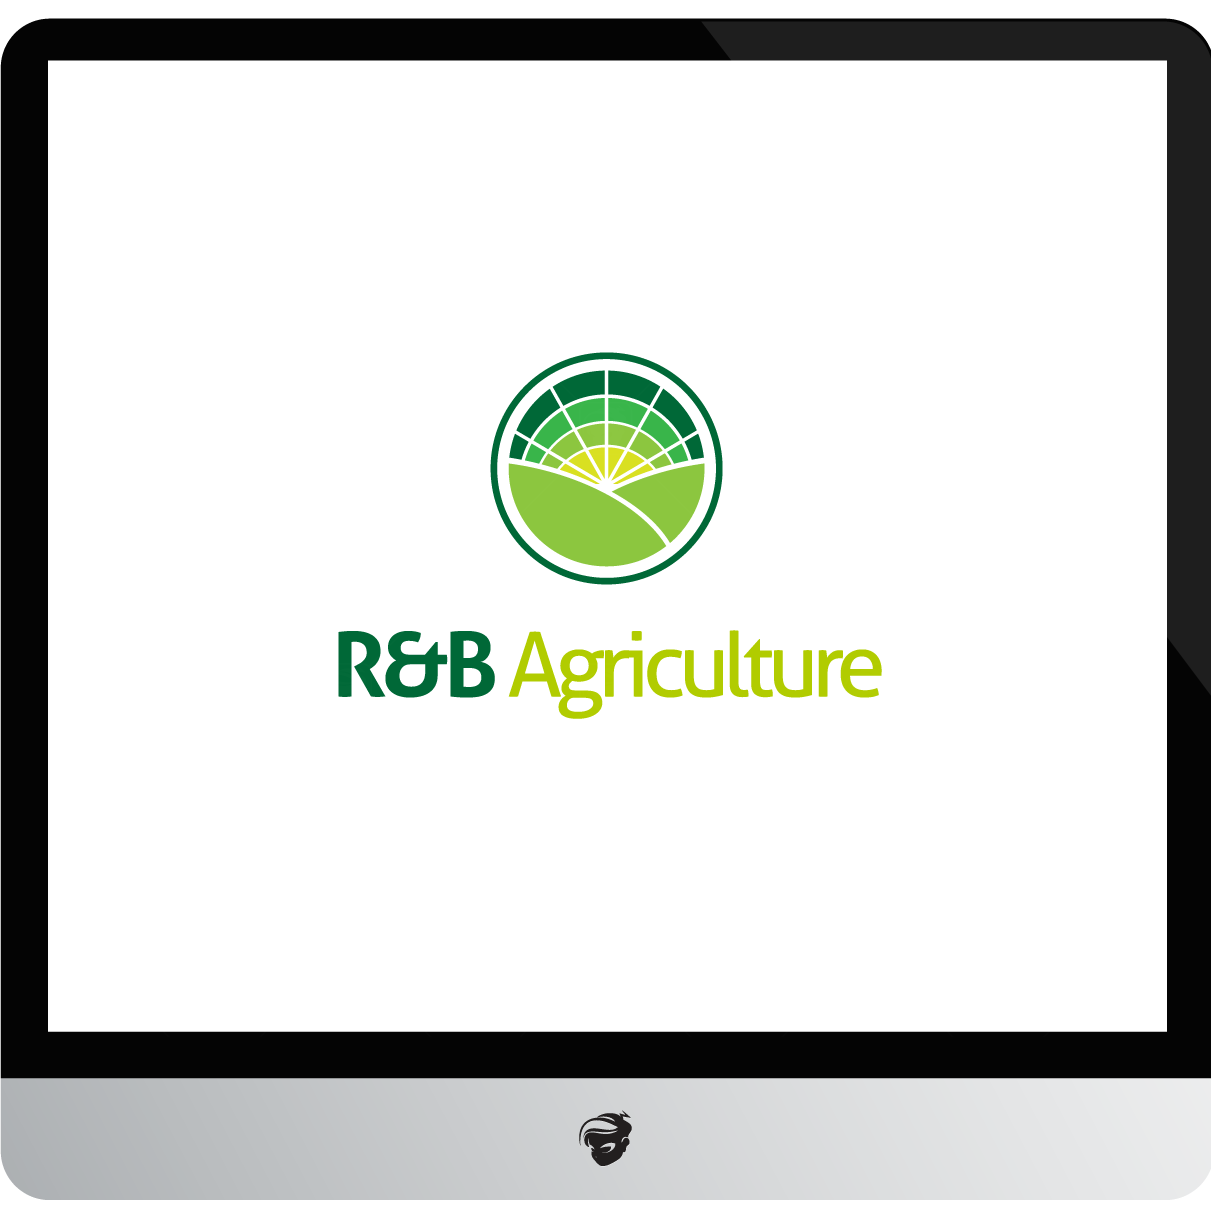 Logo Design by zesthar - Entry No. 9 in the Logo Design Contest Captivating Logo Design for R & B Agriculture.